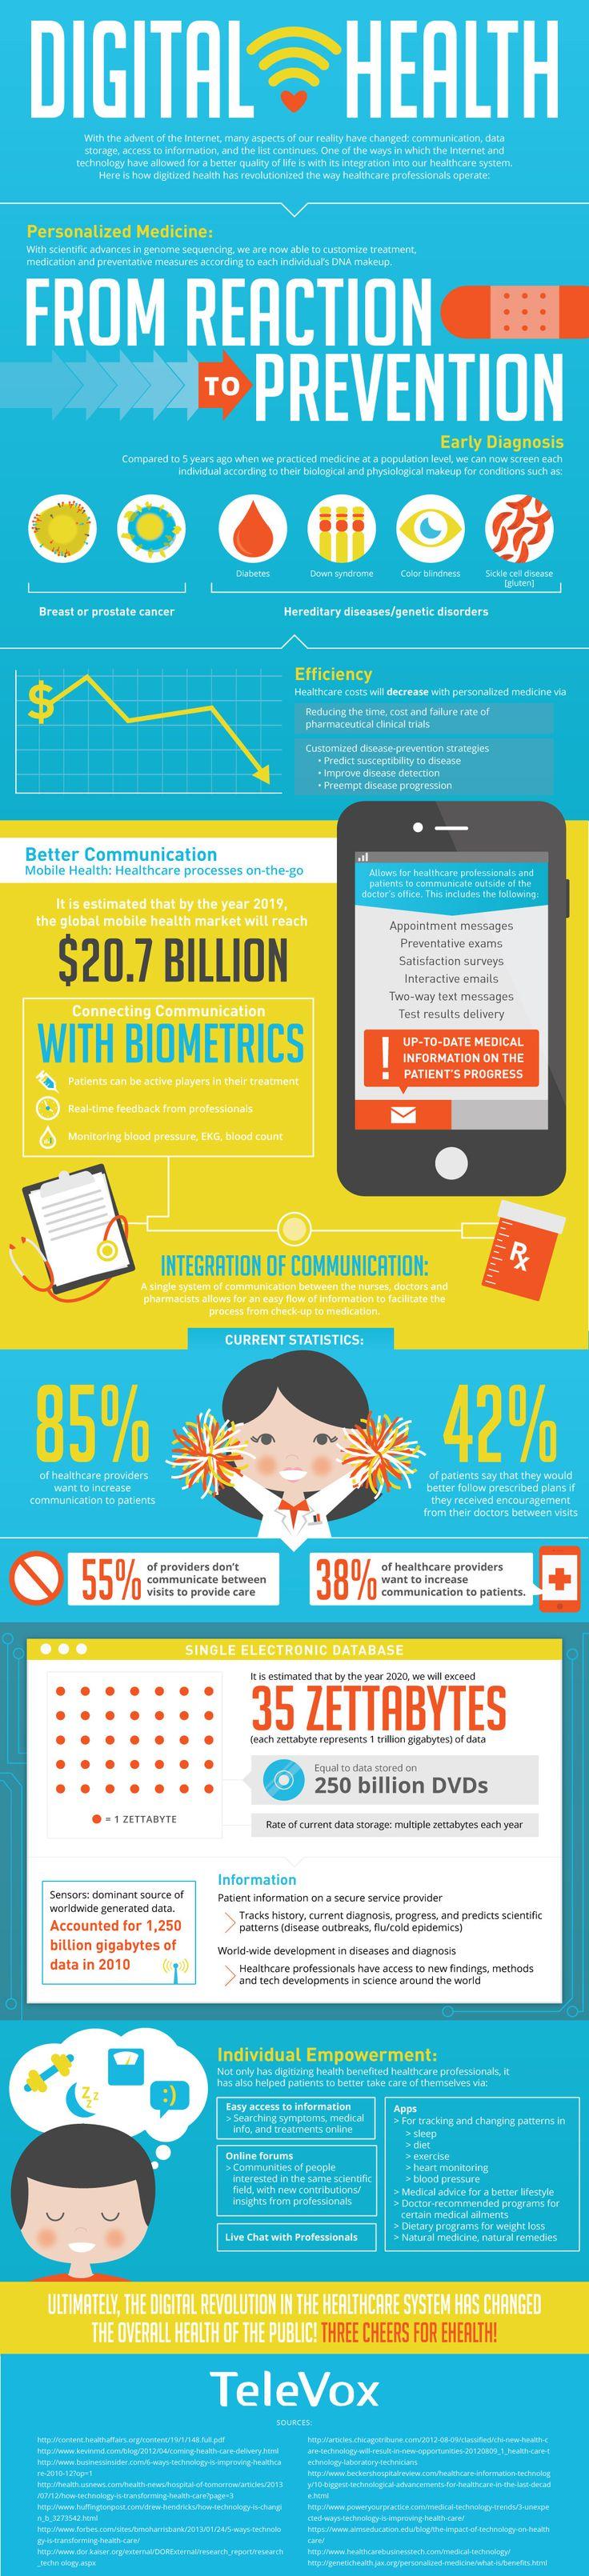 Digital Health #infographic #Health #Technology